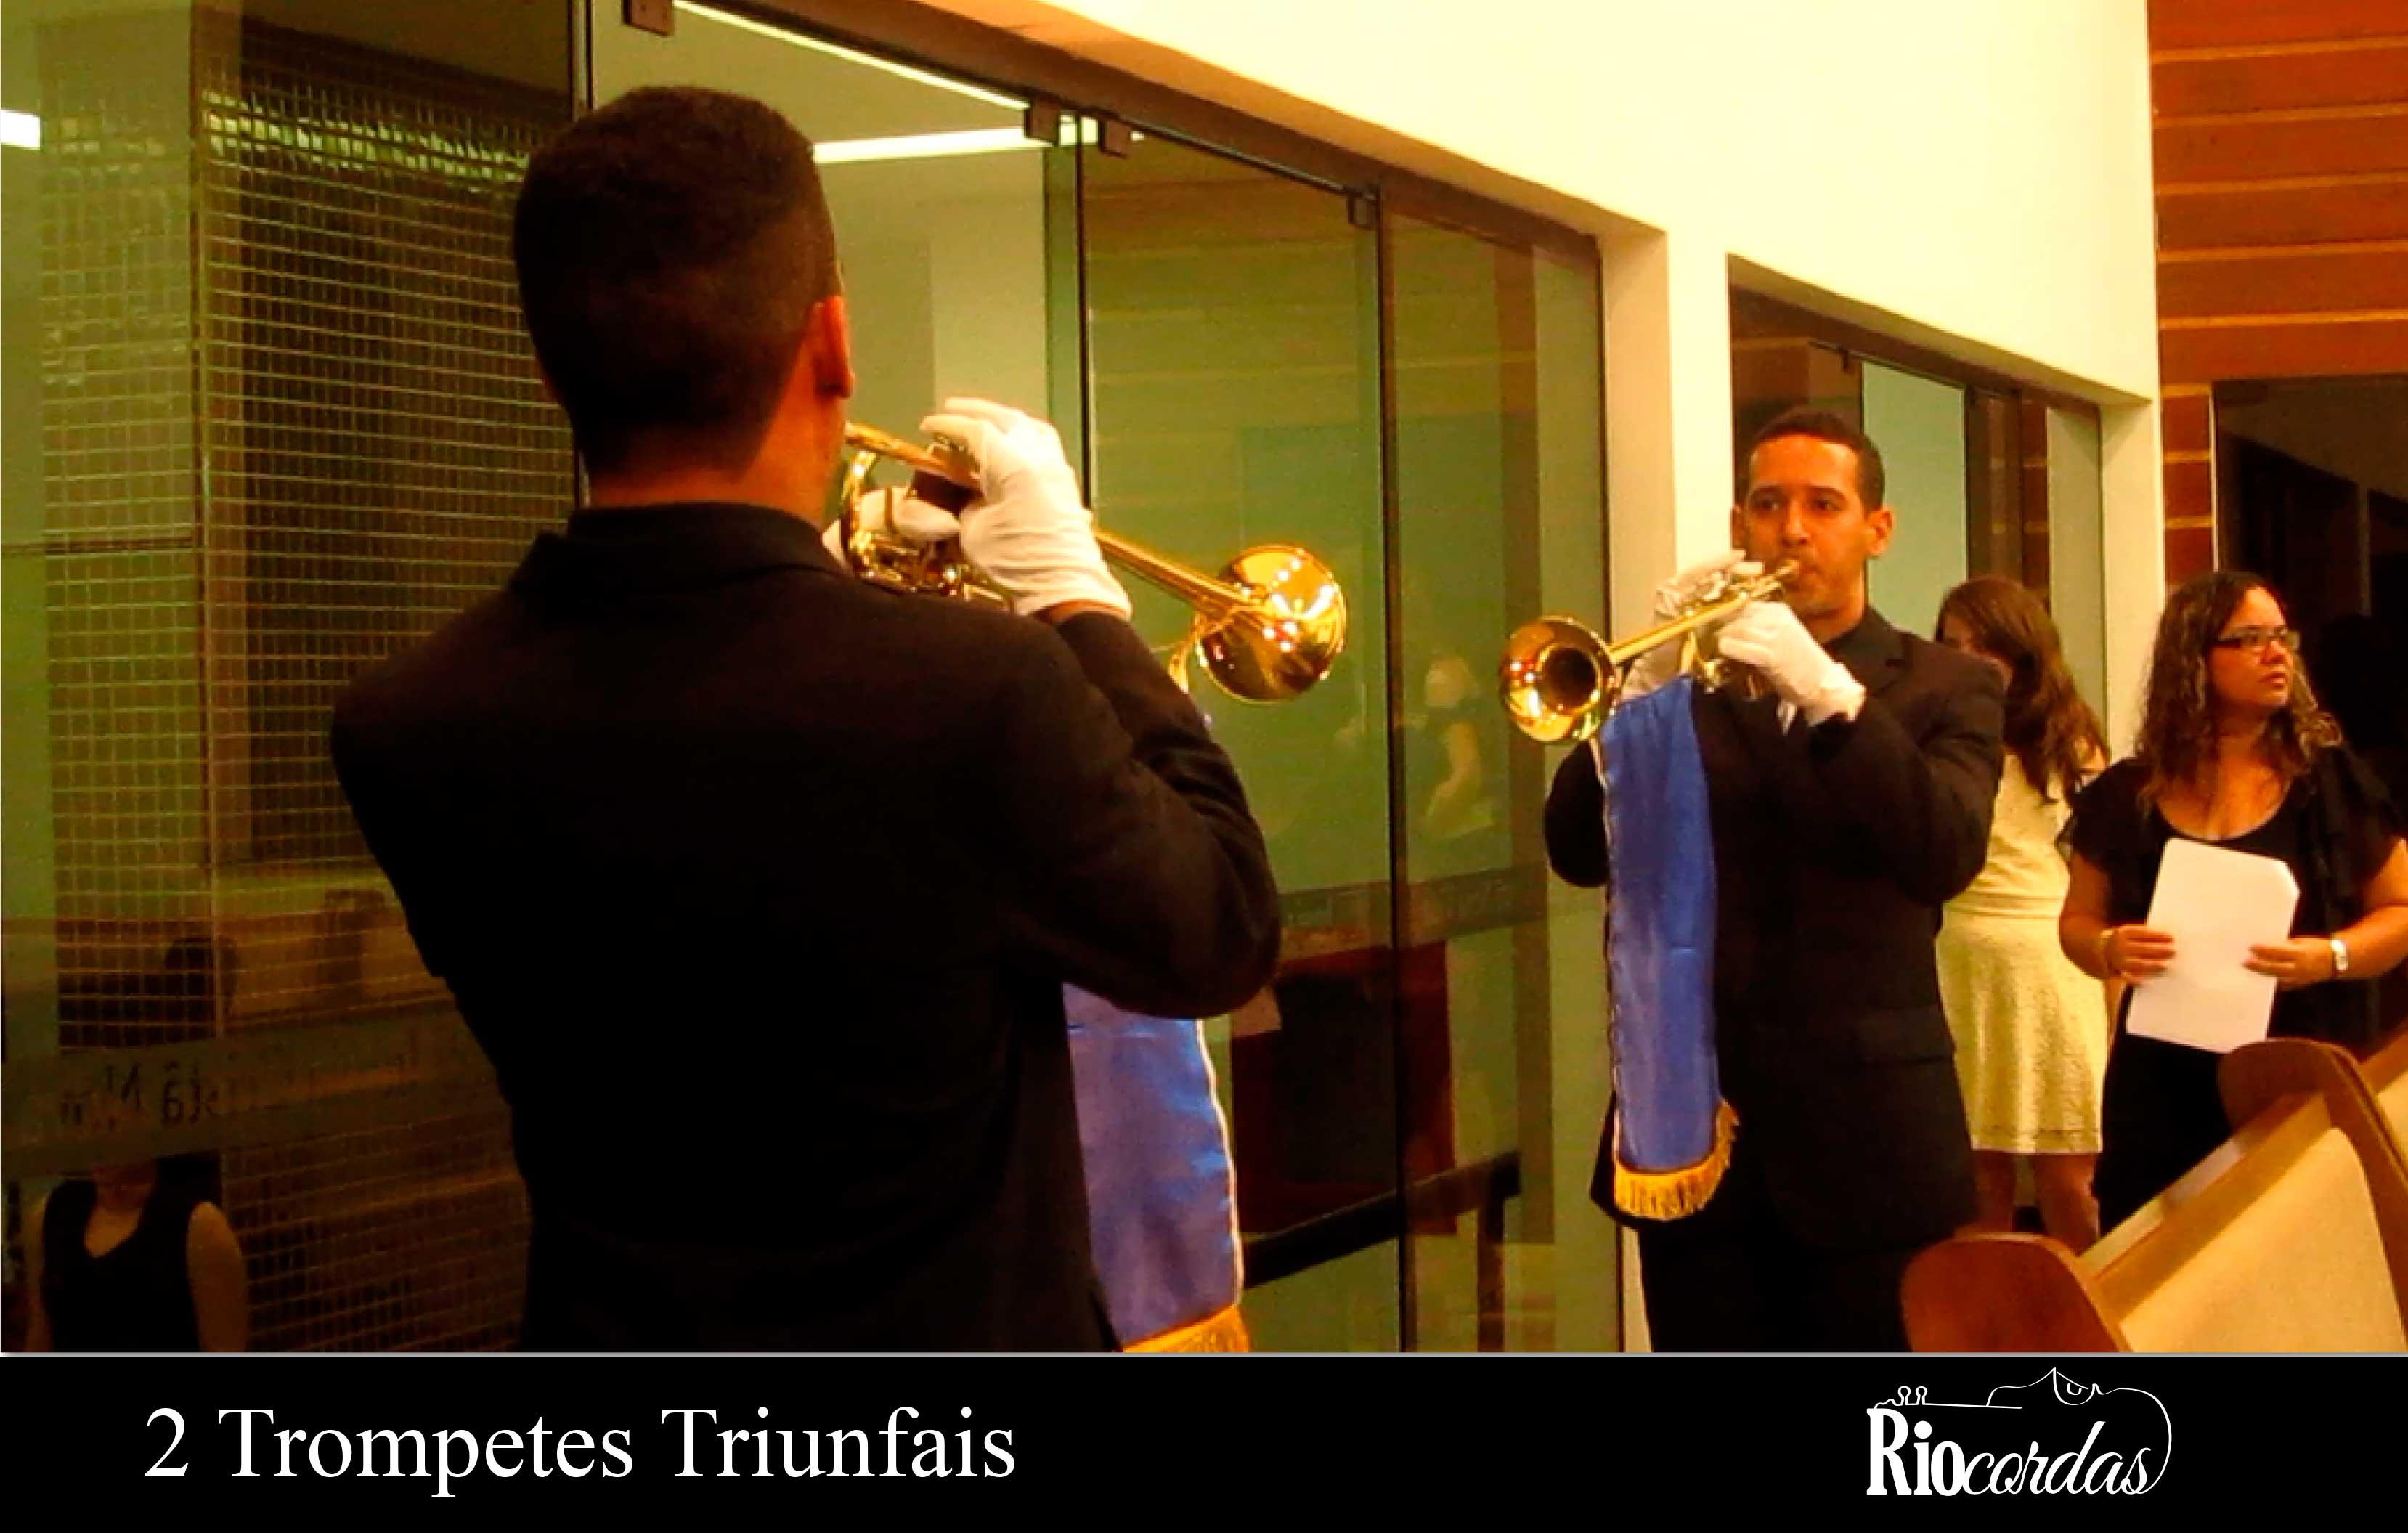 2-trompetes-triunfais-updraft-pre-smush-original